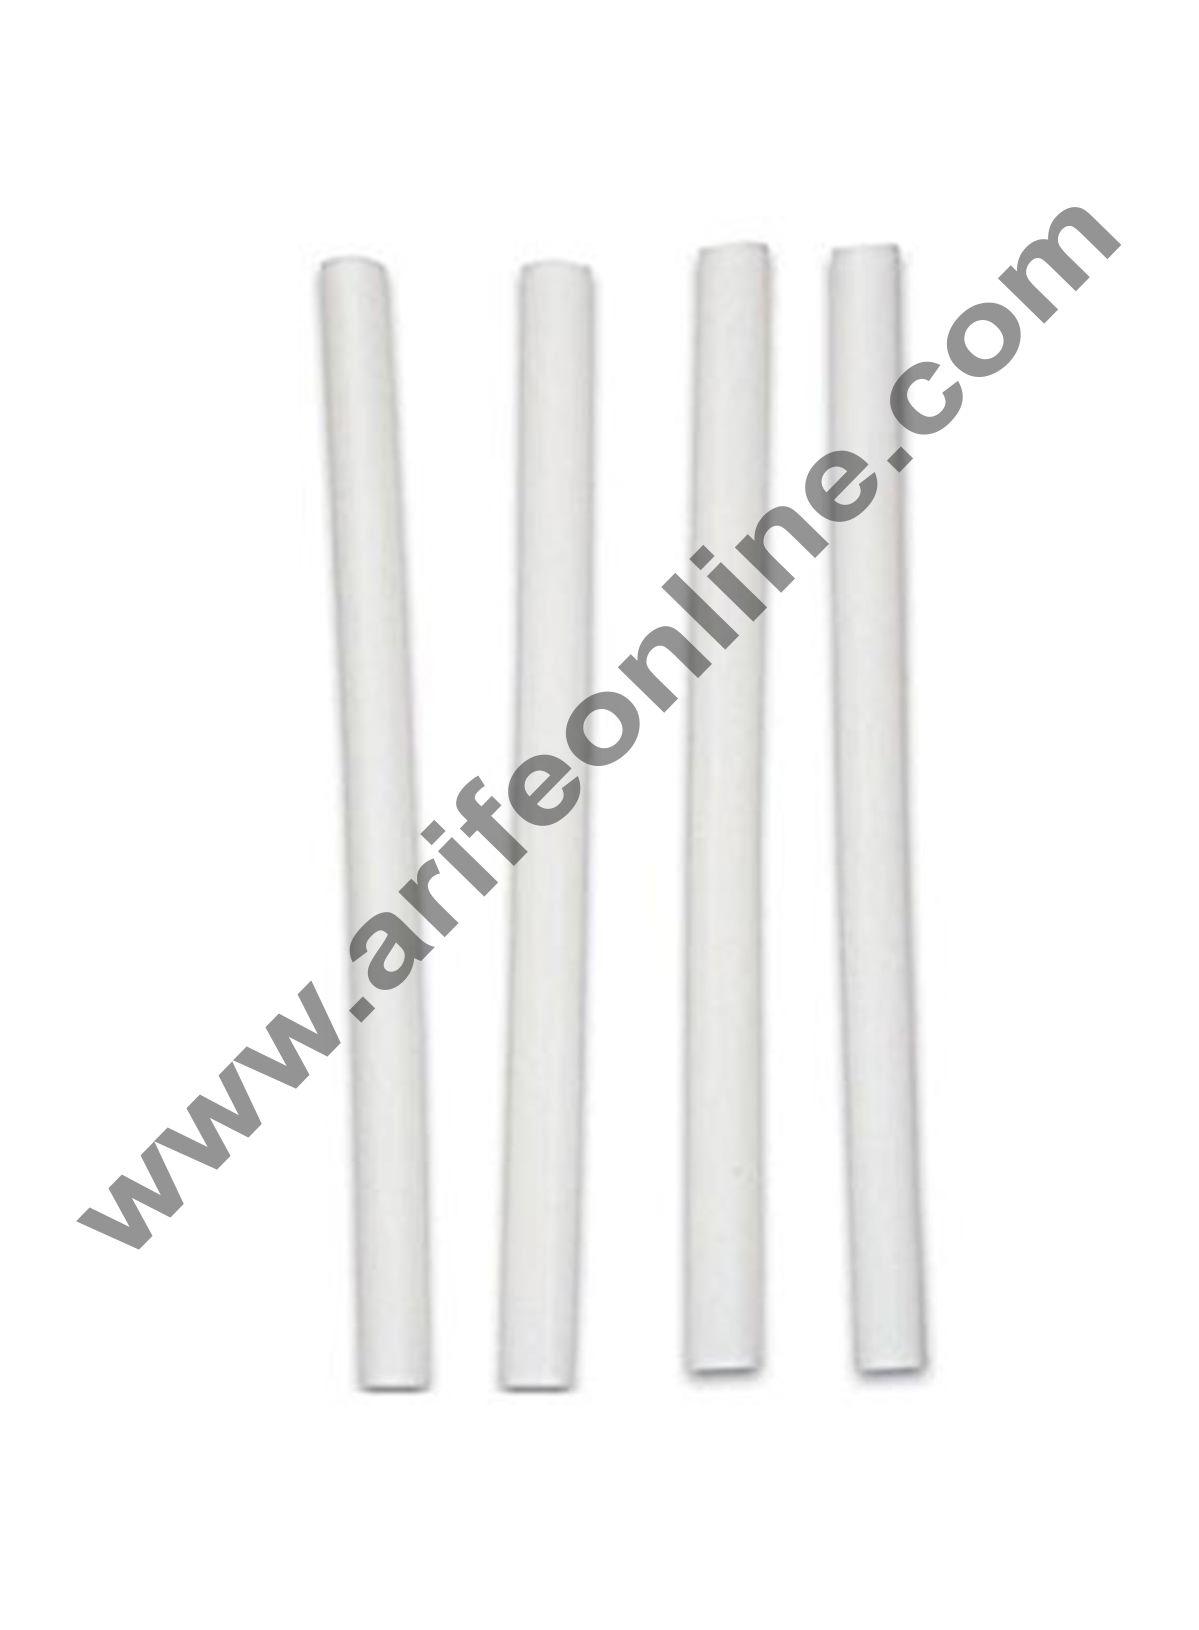 Cake Decor Plastic Dowel Rod - Four Pack